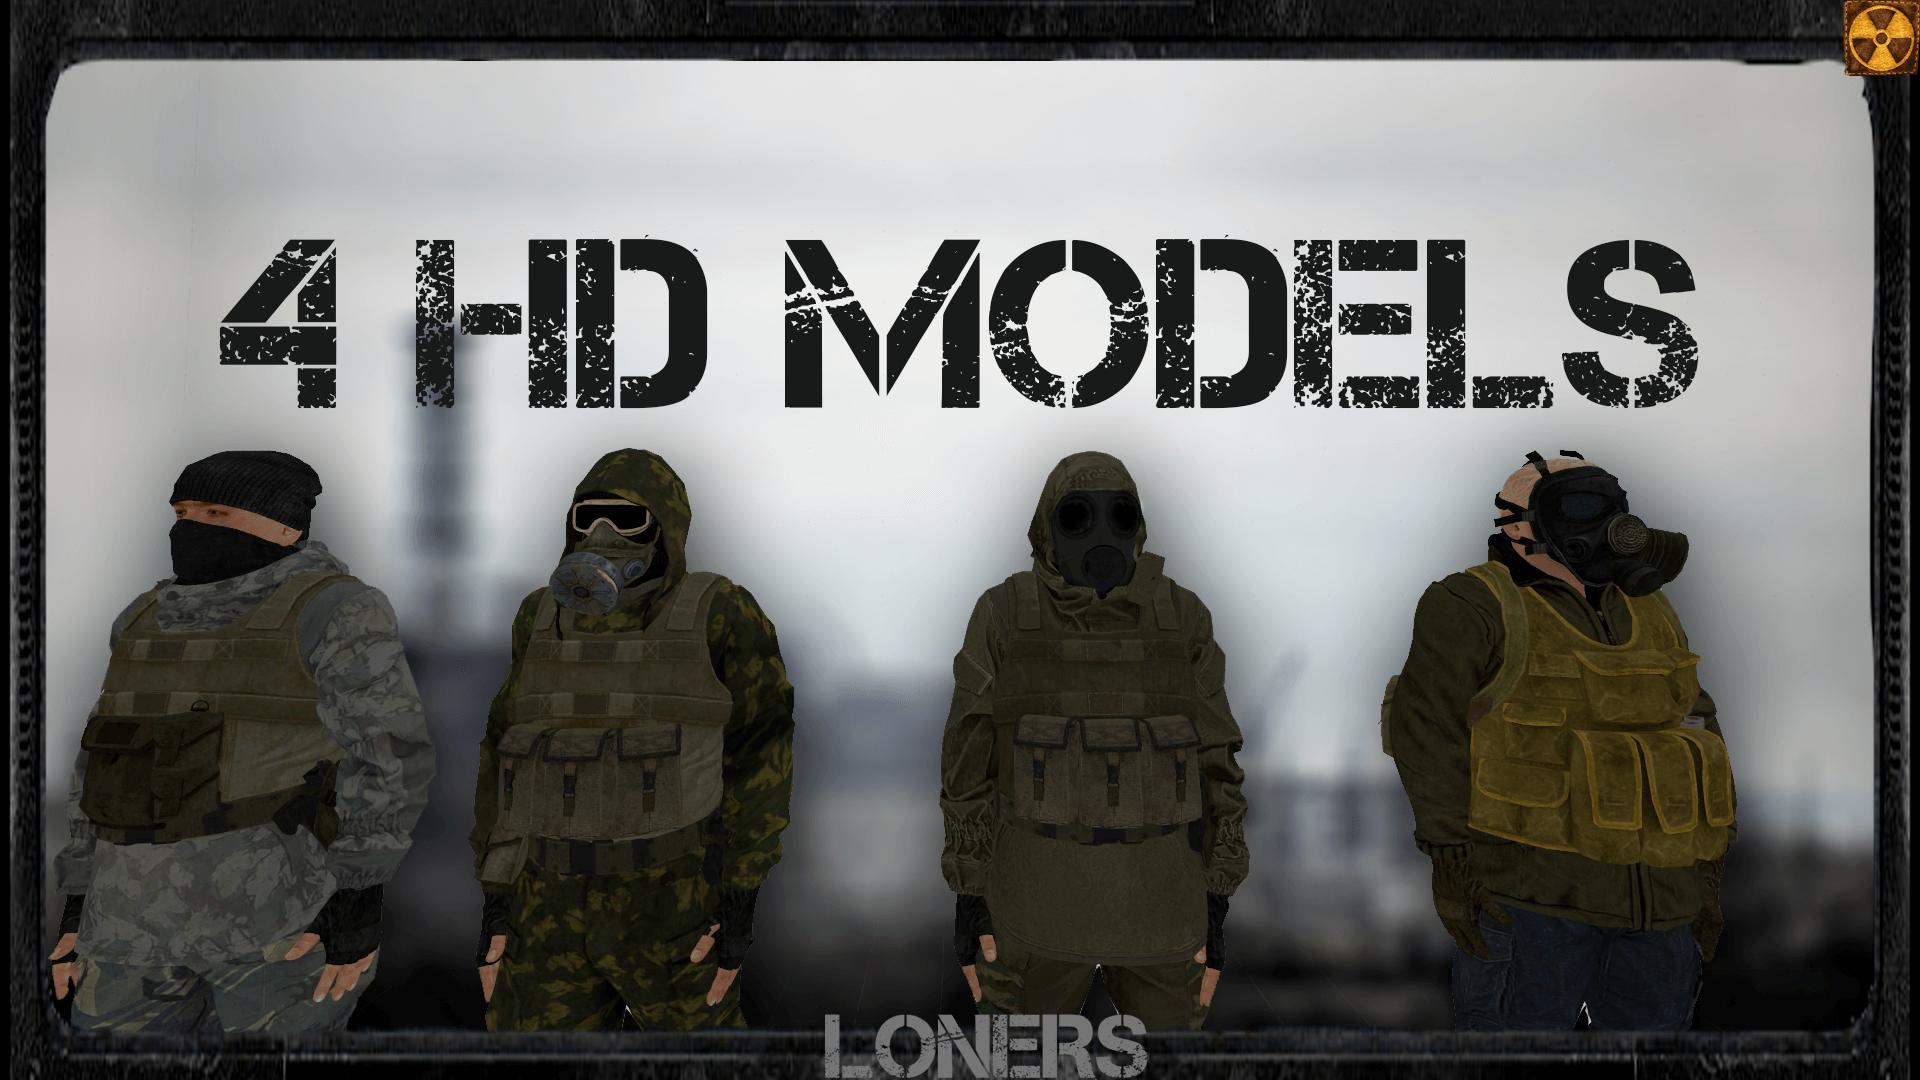 Garry's Mod - Одиночки из S.T.A.L.K.E.R (модели игрока)